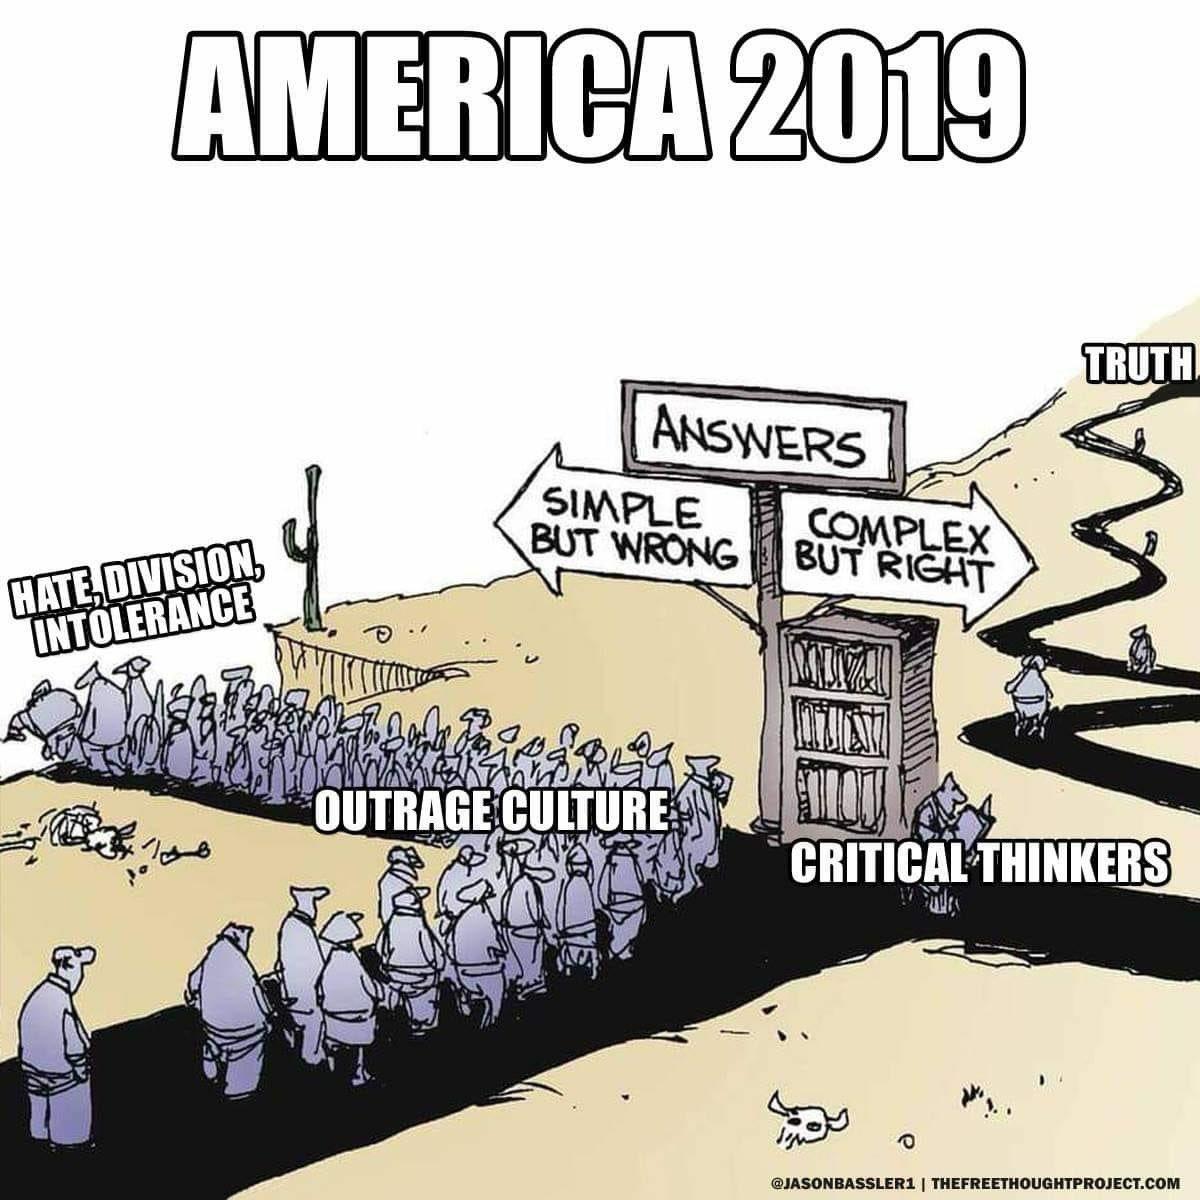 World 2019?